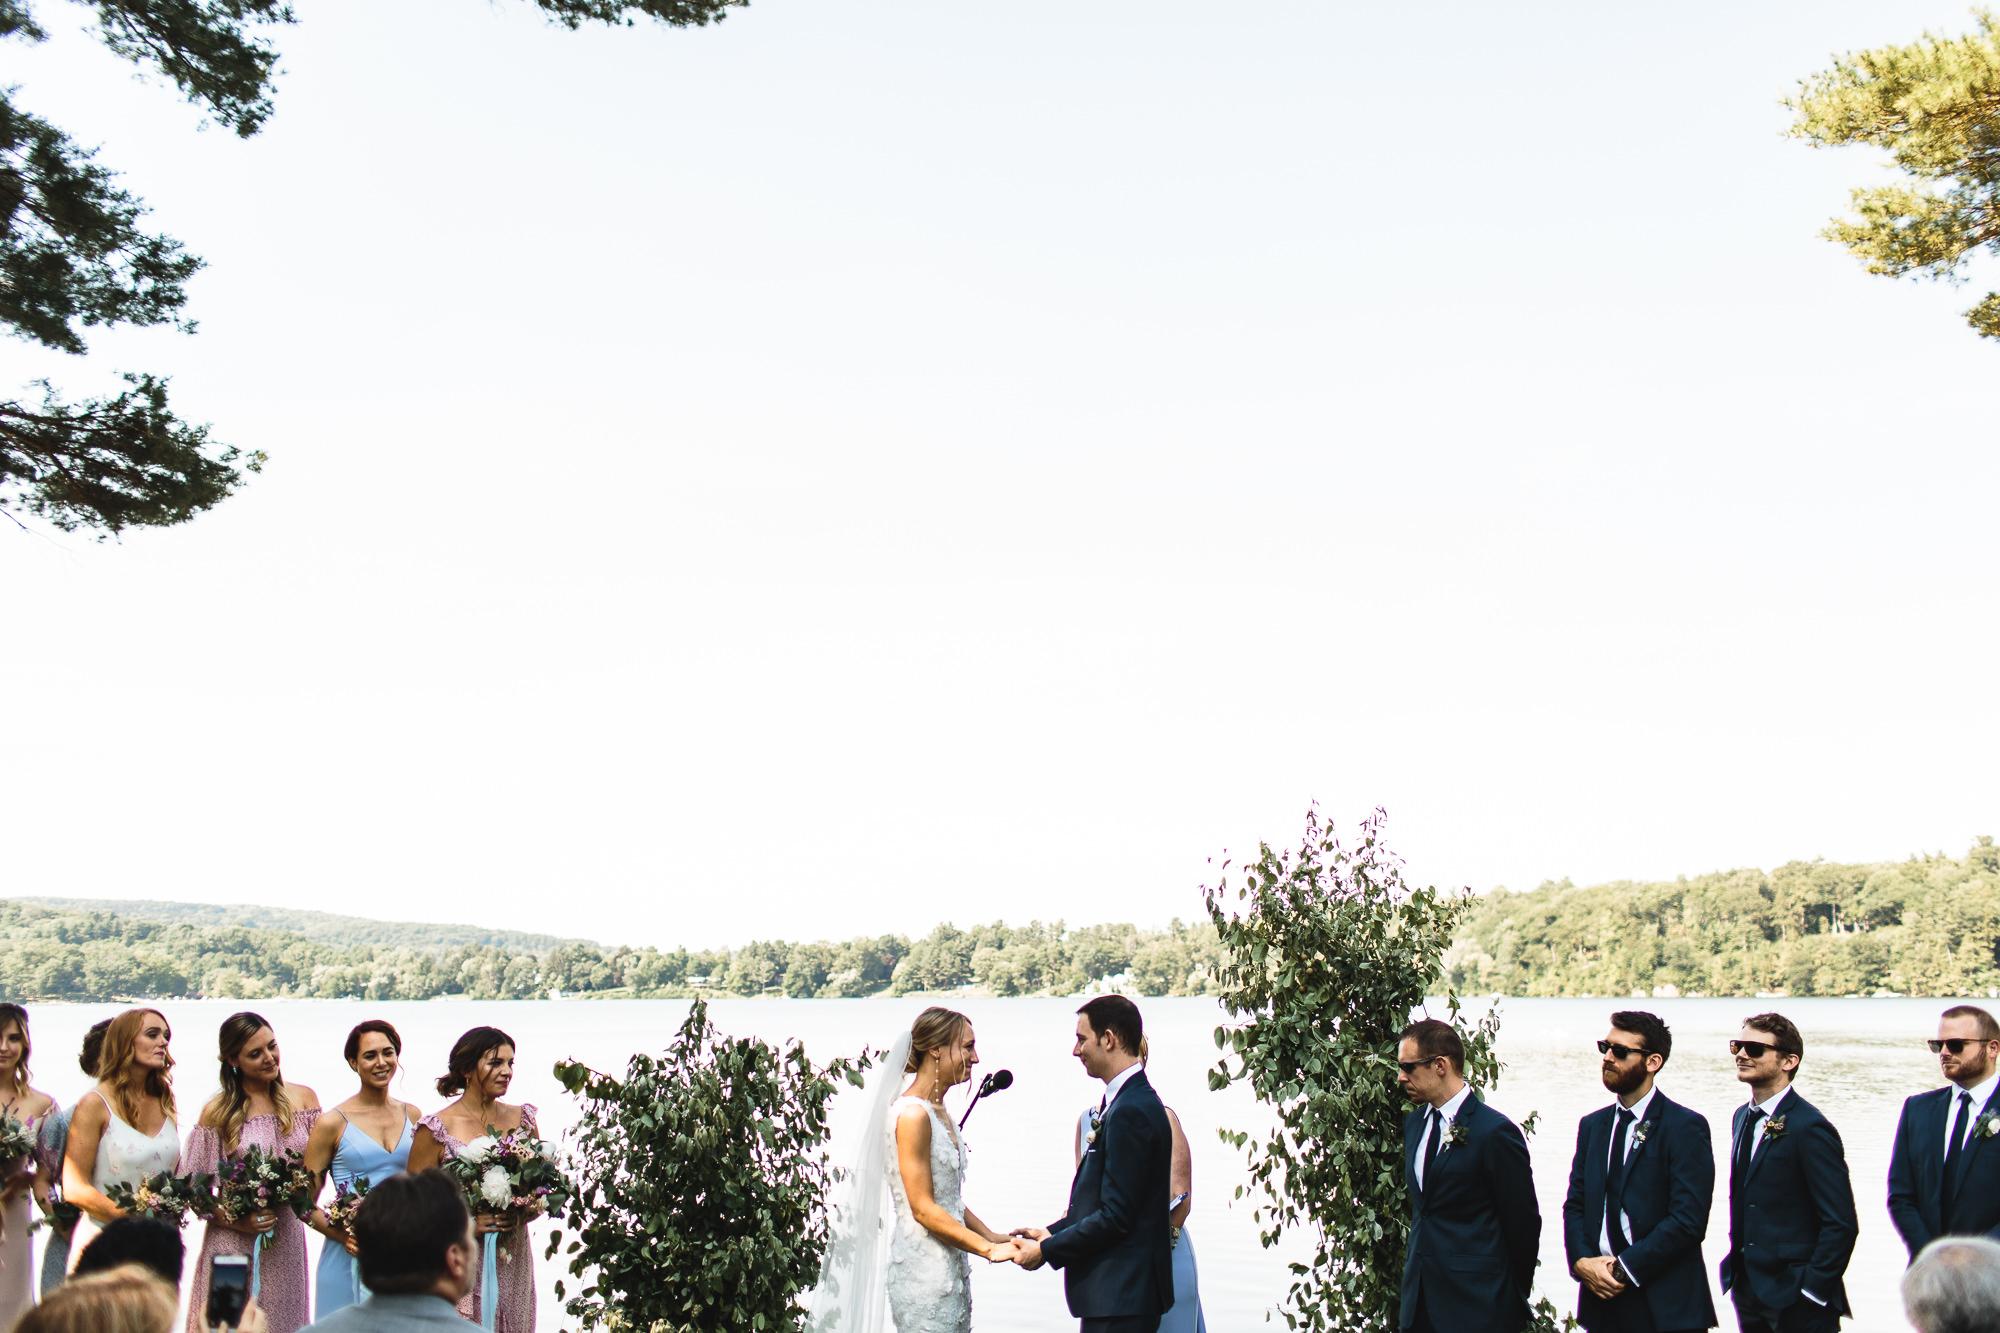 connecticut-summer-lake-wedding-emily-kirke-photography-upstyle (90 of 181).jpg